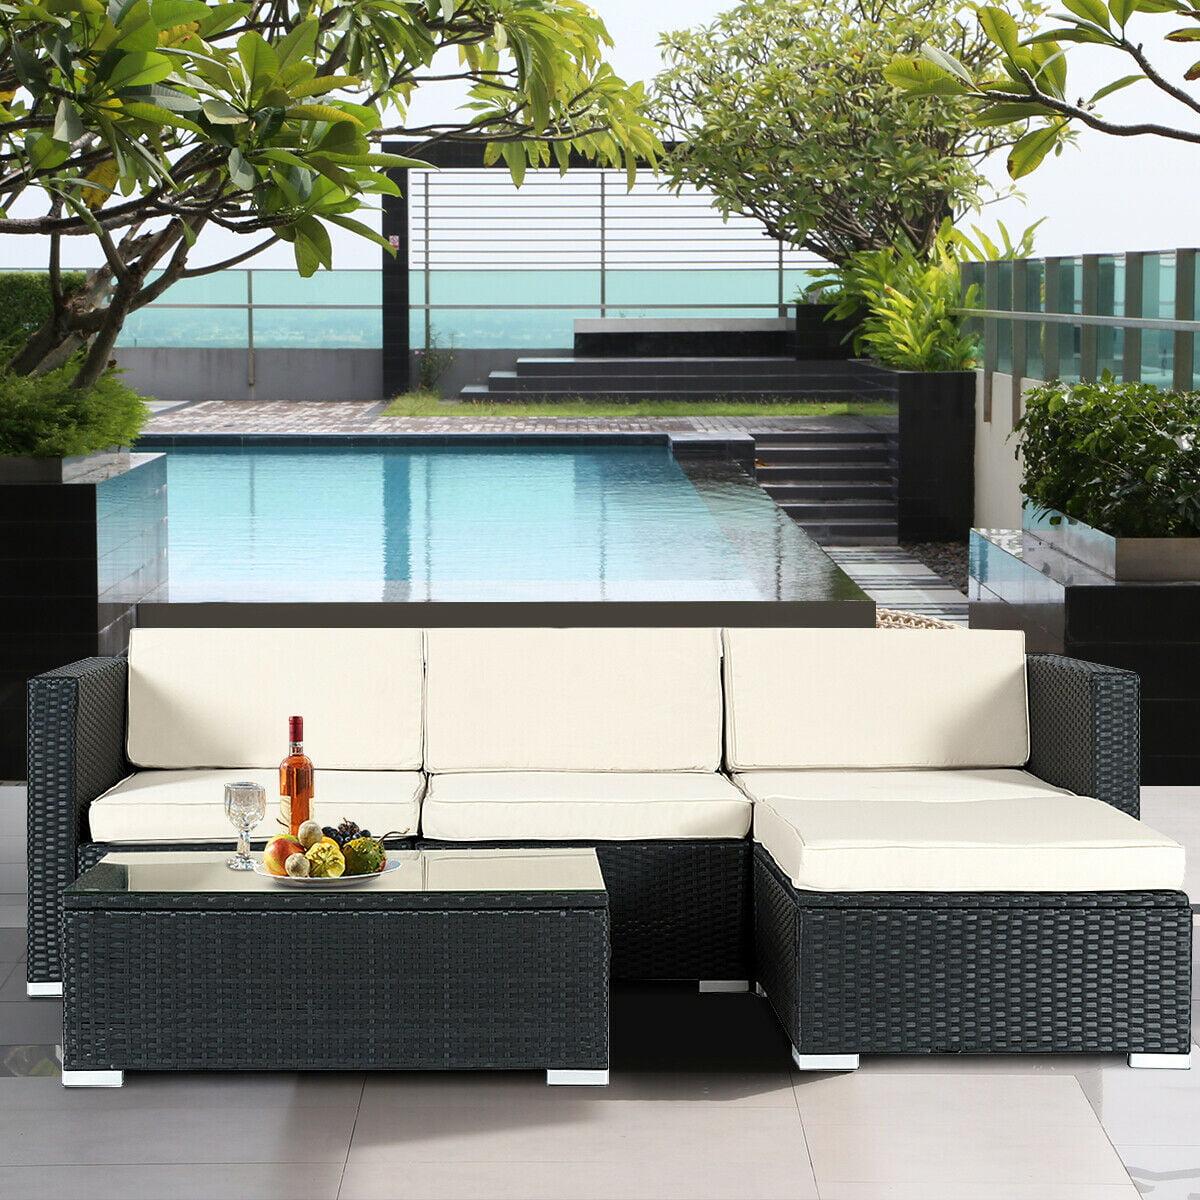 Gymax Rattan Wicker Table Shelf Garden Sofa 5 PCS Patio Furniture Set W/ Cushion Black